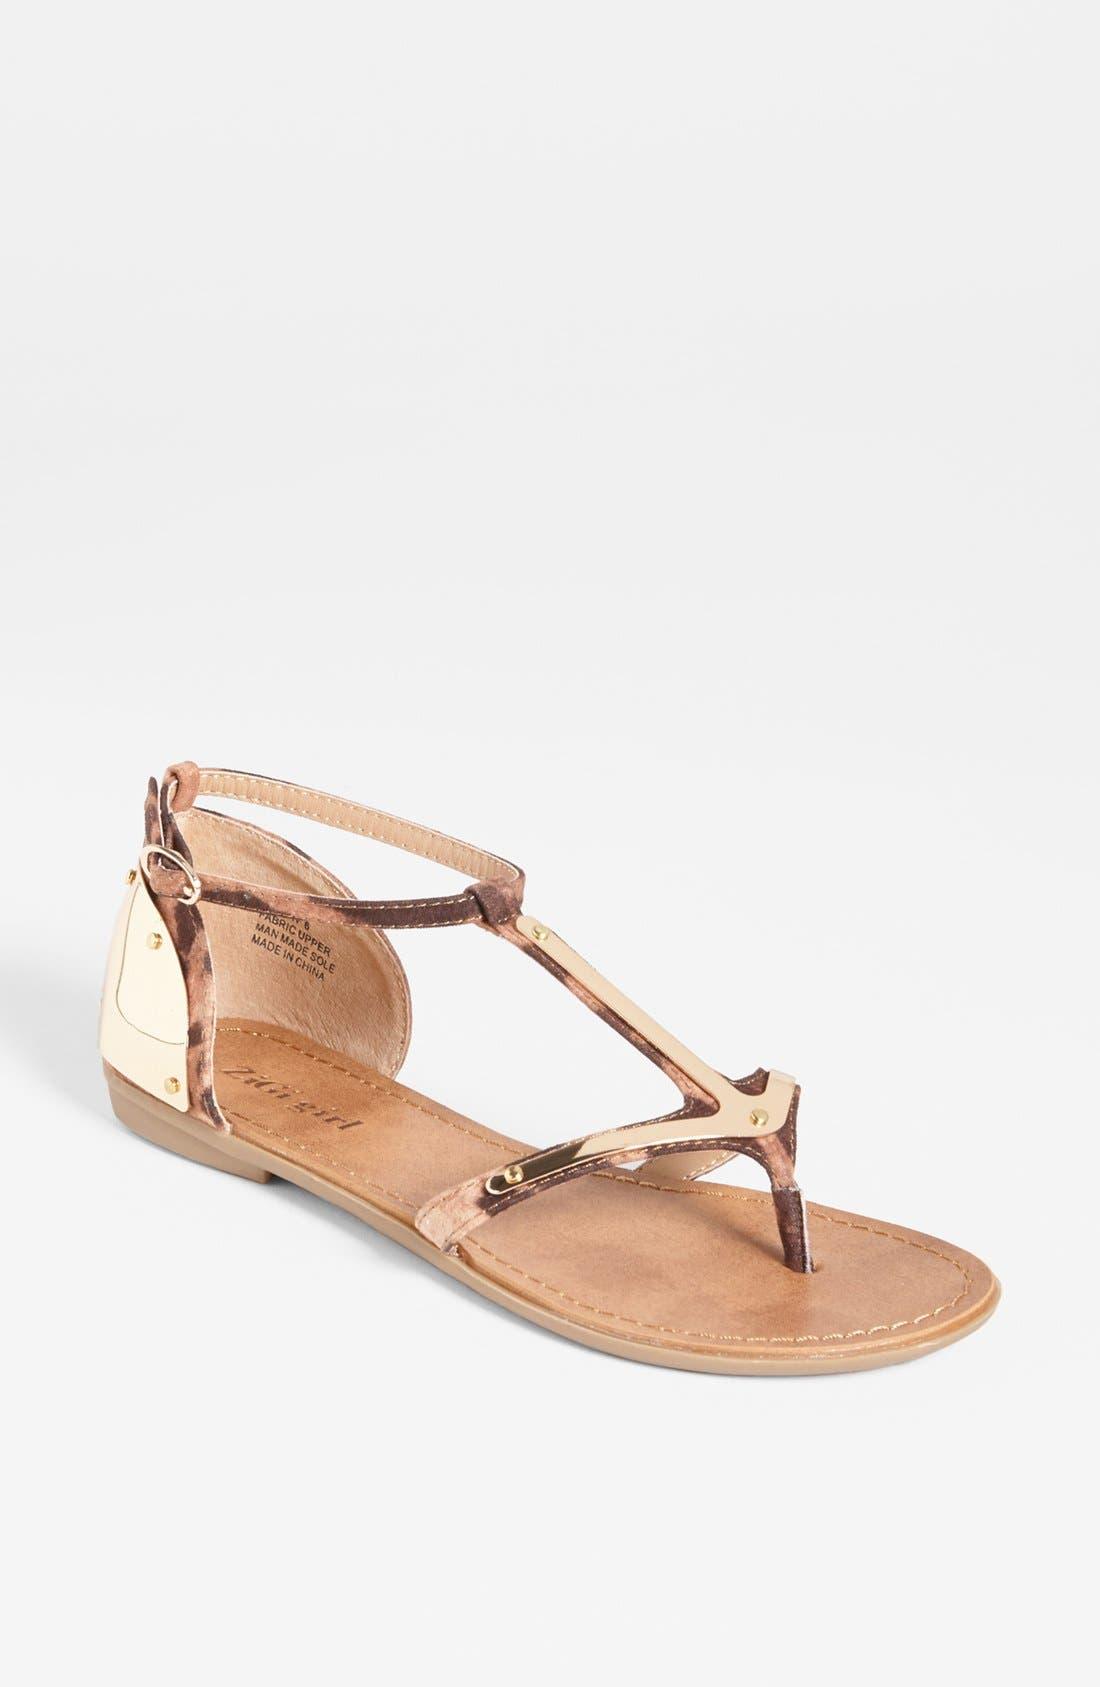 Main Image - ZiGi girl 'Arrow' Sandal